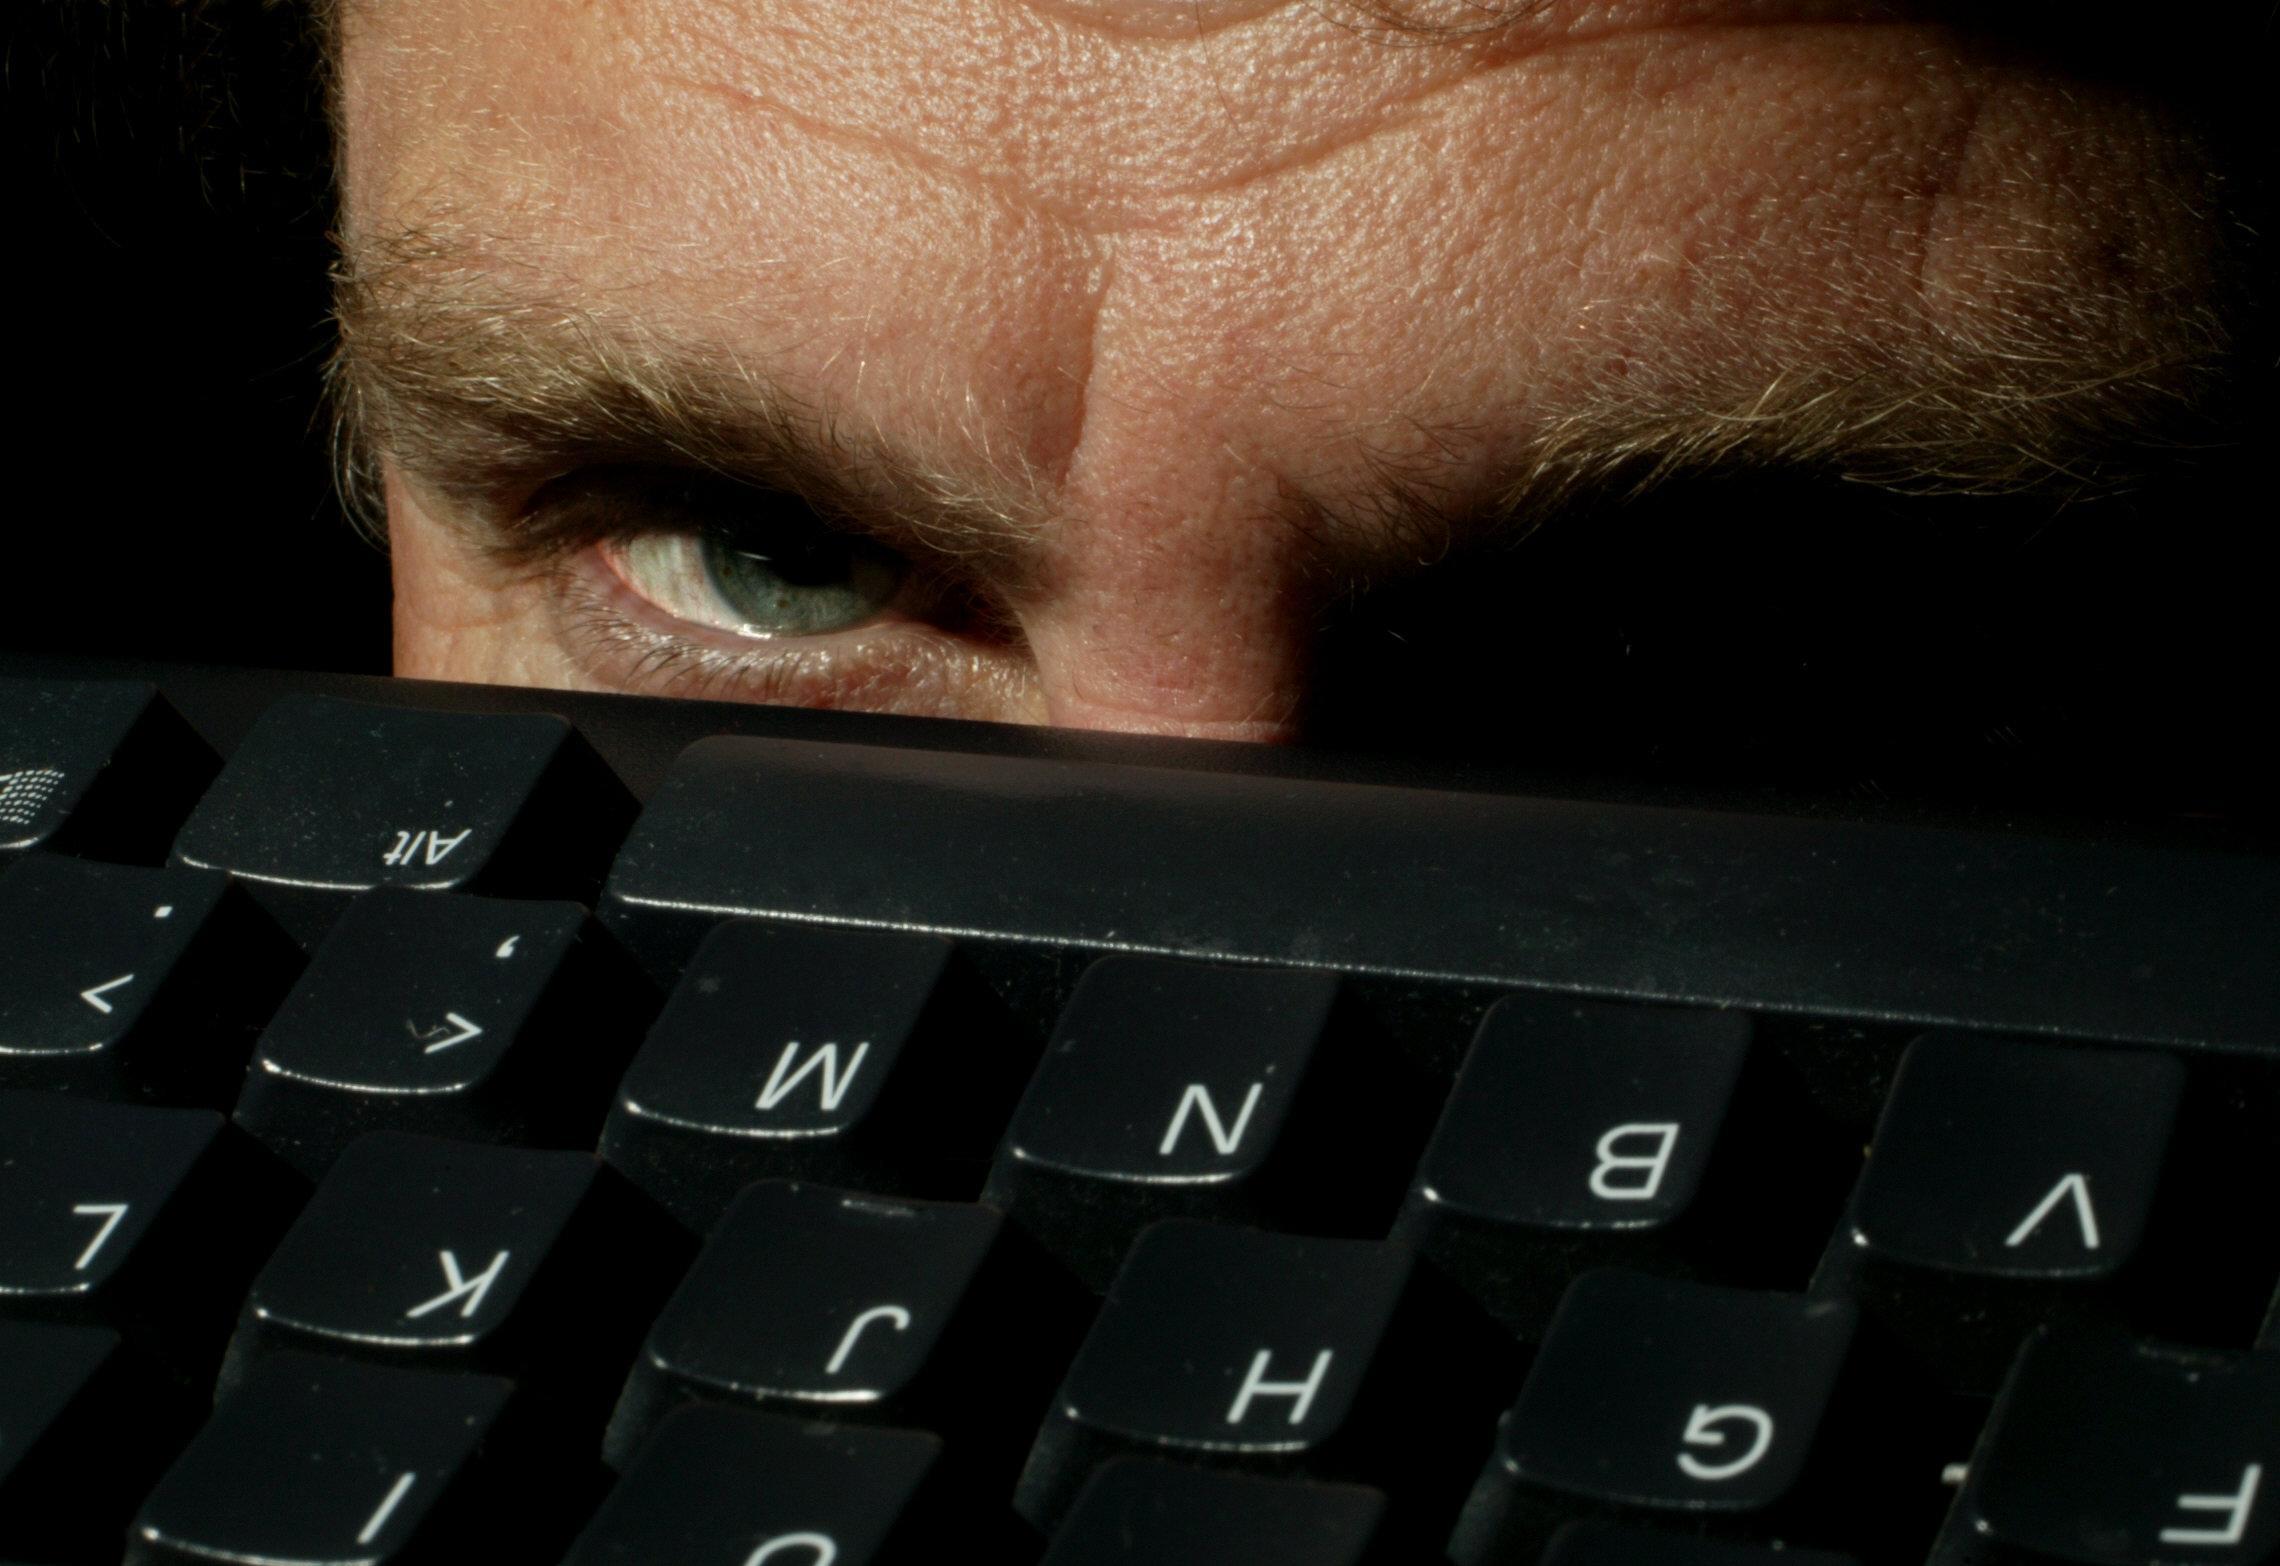 Eye overlooking a computer keyboard